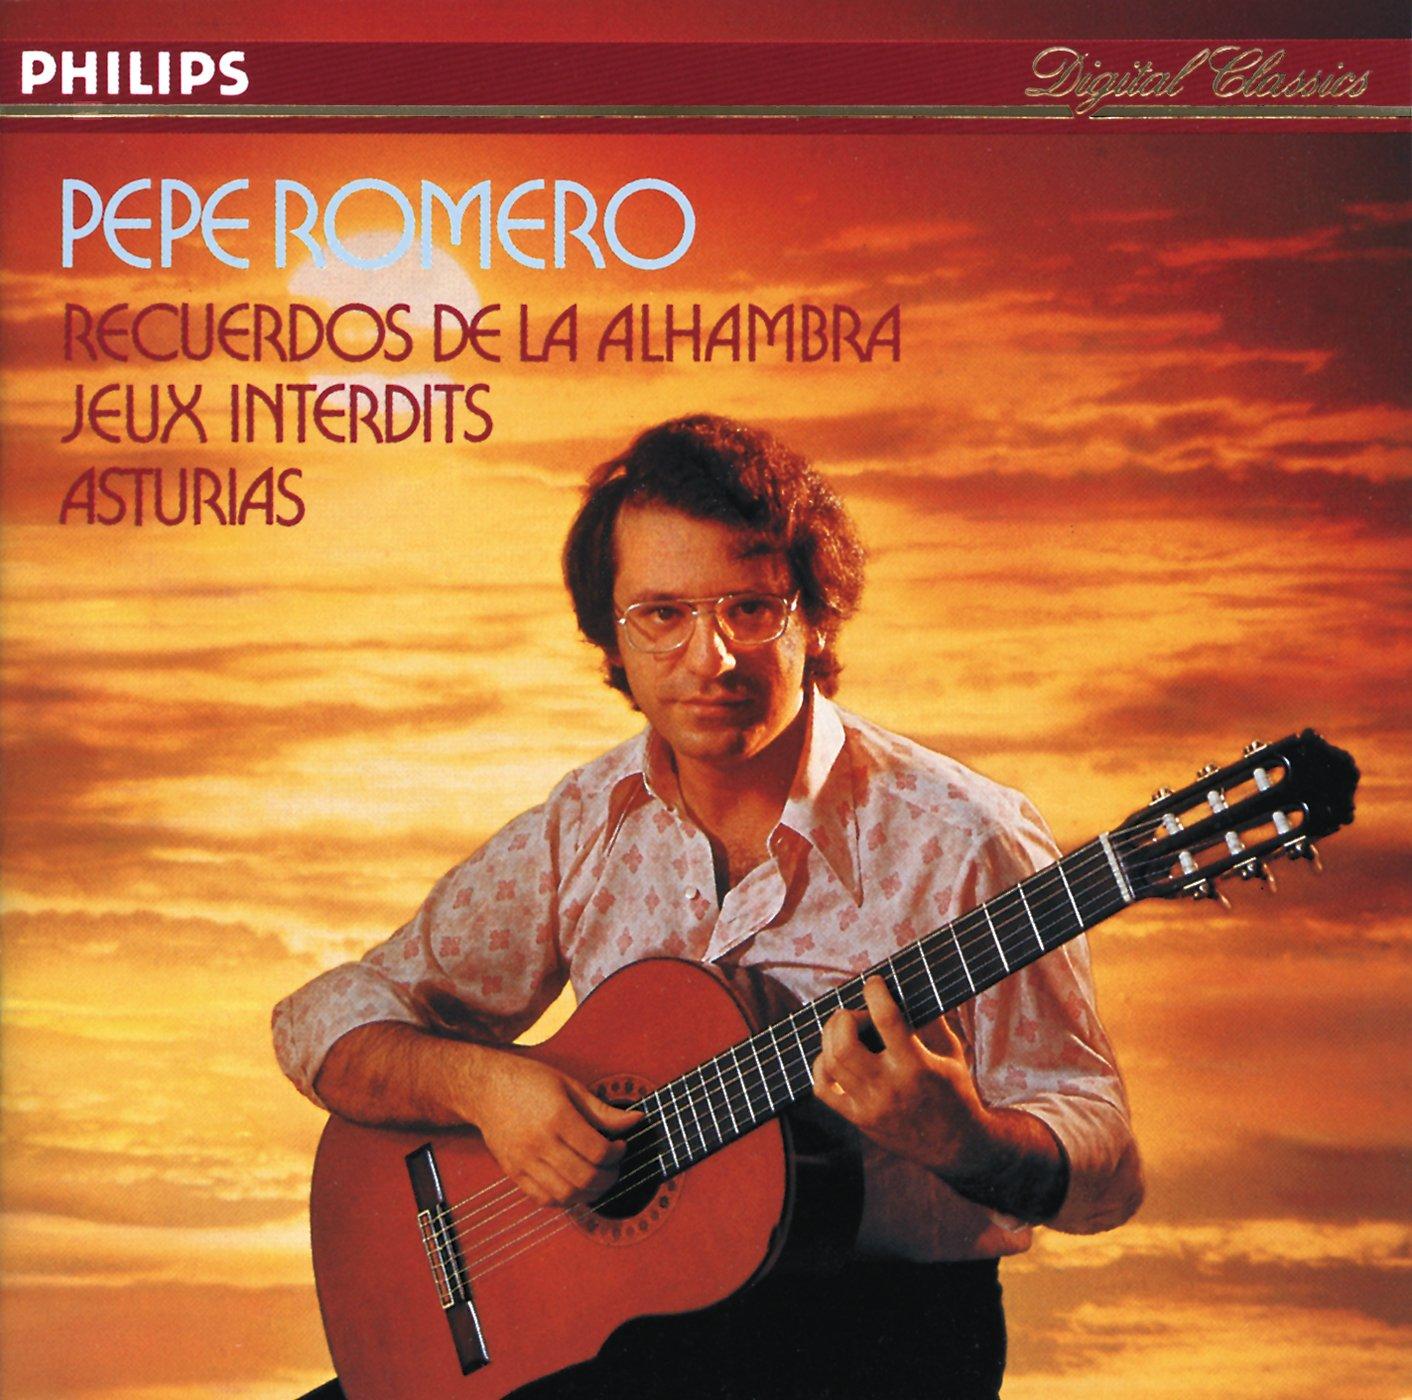 Pepe Romero: Recuerdos de la Alhambra / Jeux Interdits / Asturias by Philips